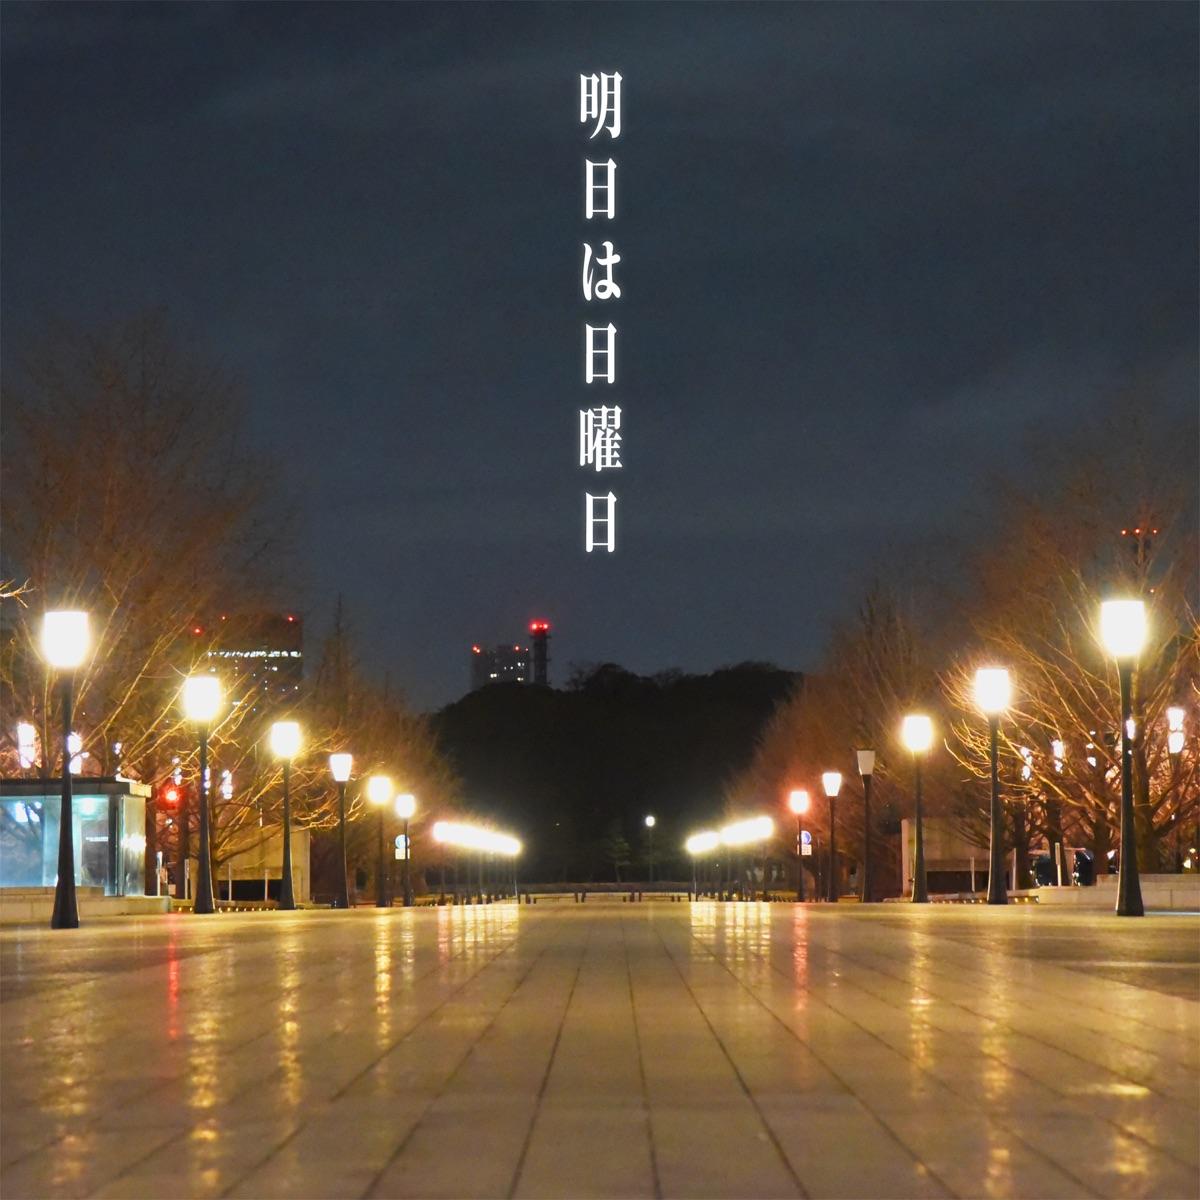 『Rain Drops - 明日は日曜日』収録の『明日は日曜日』ジャケット